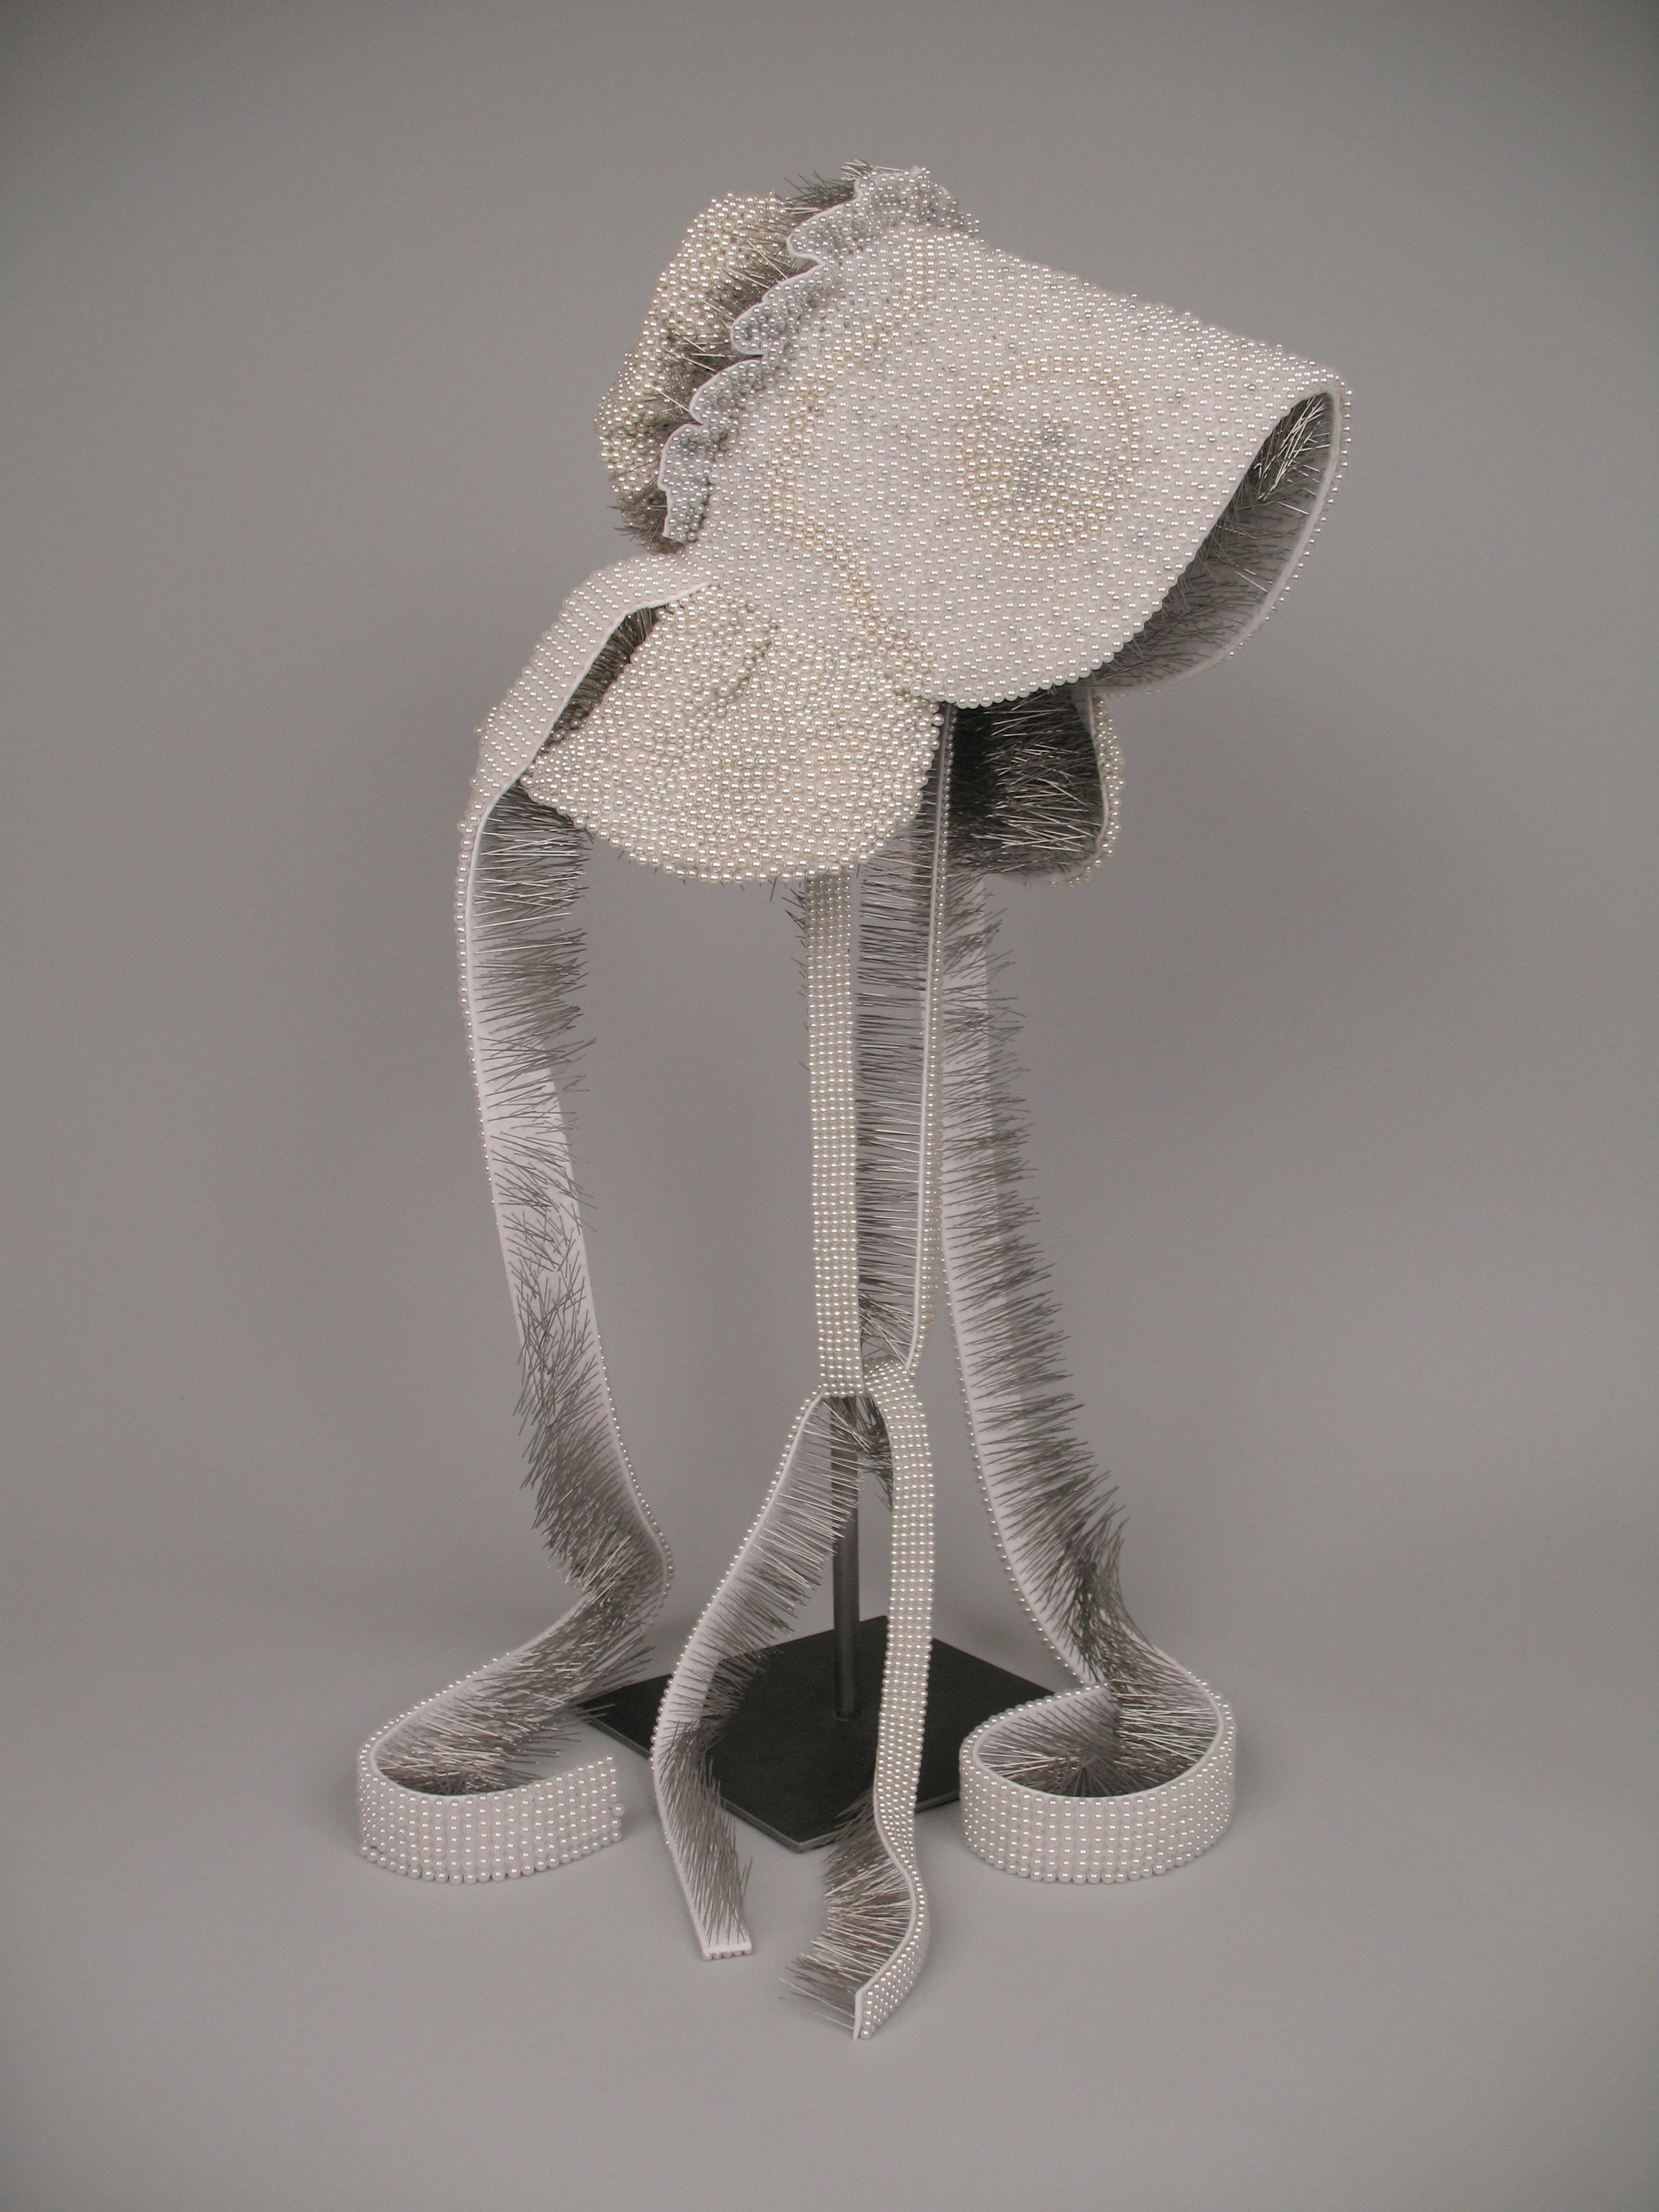 "Seer Bonnet XIII  14,052 pearl corsage pins, fabric, steel,29"" x 12"" x 15"", 2010"